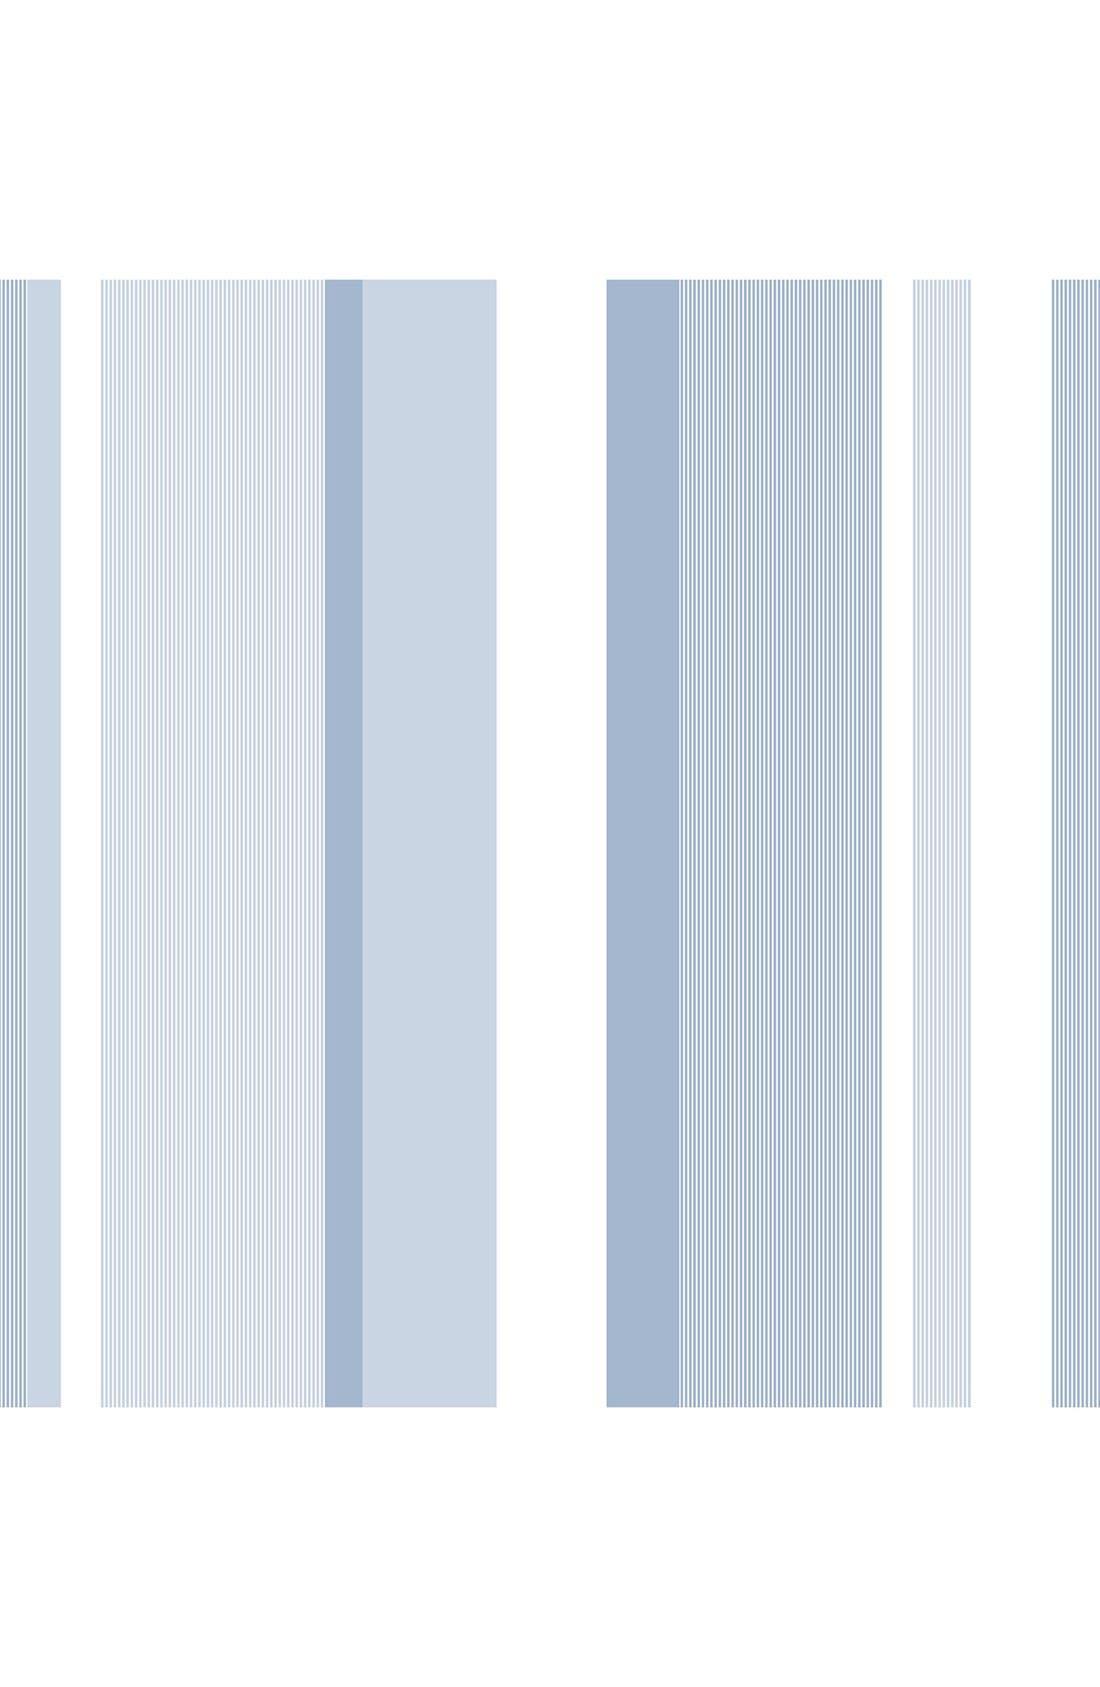 Main Image - Wallpops Awning Stripe Reusable Peel & Stick Vinyl Wallpaper